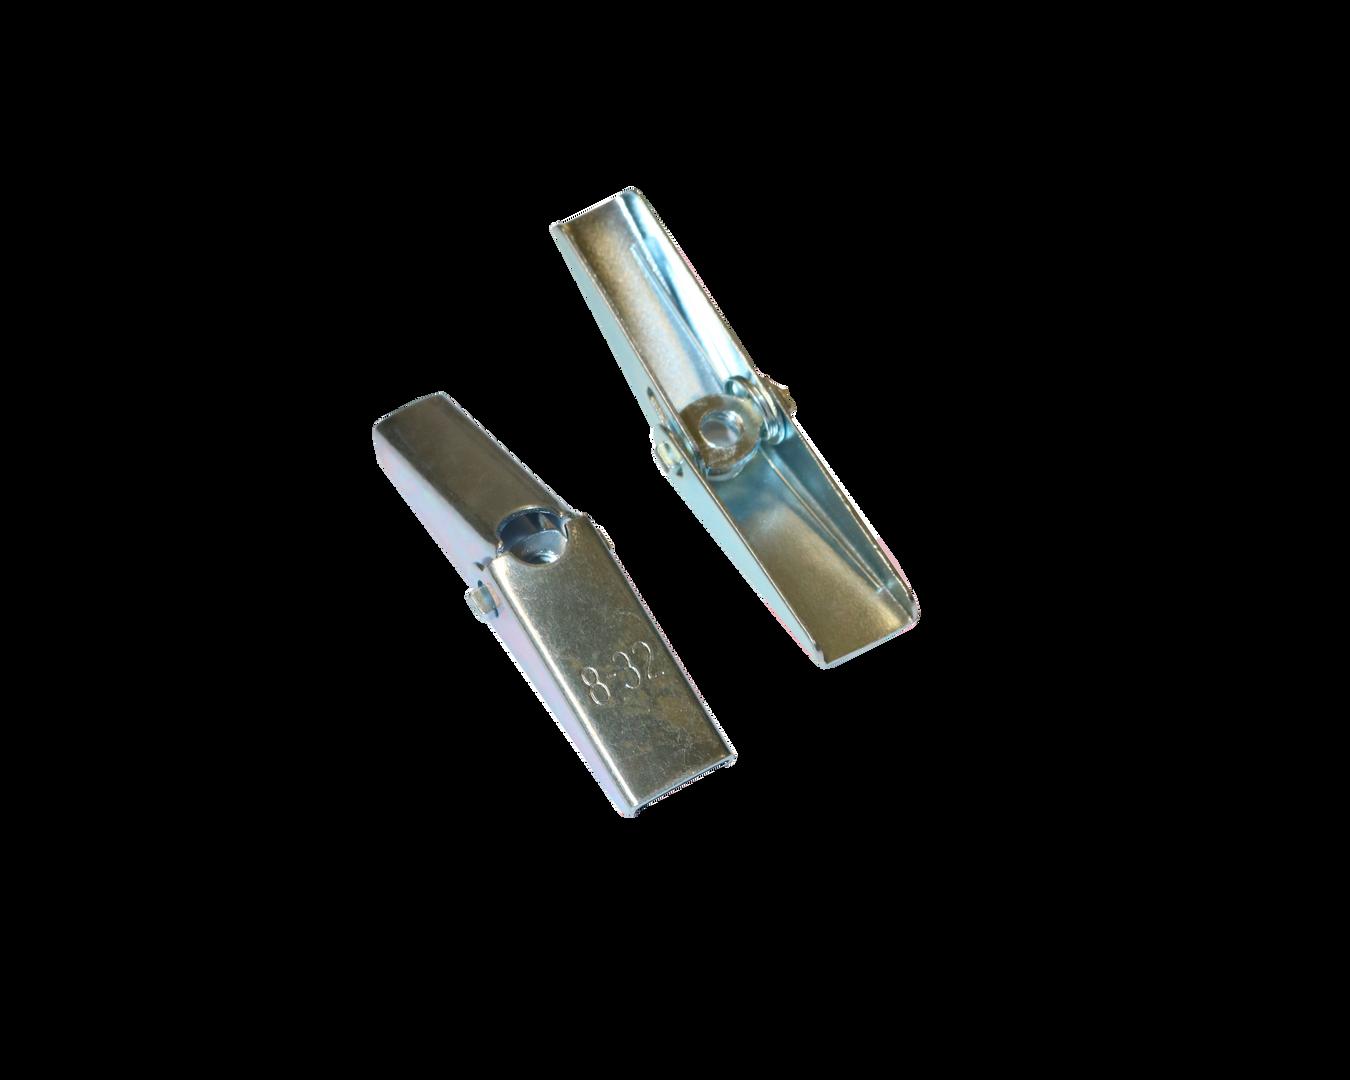 F-60573_Zinc_Plated_Toggle_Nut - cutout.